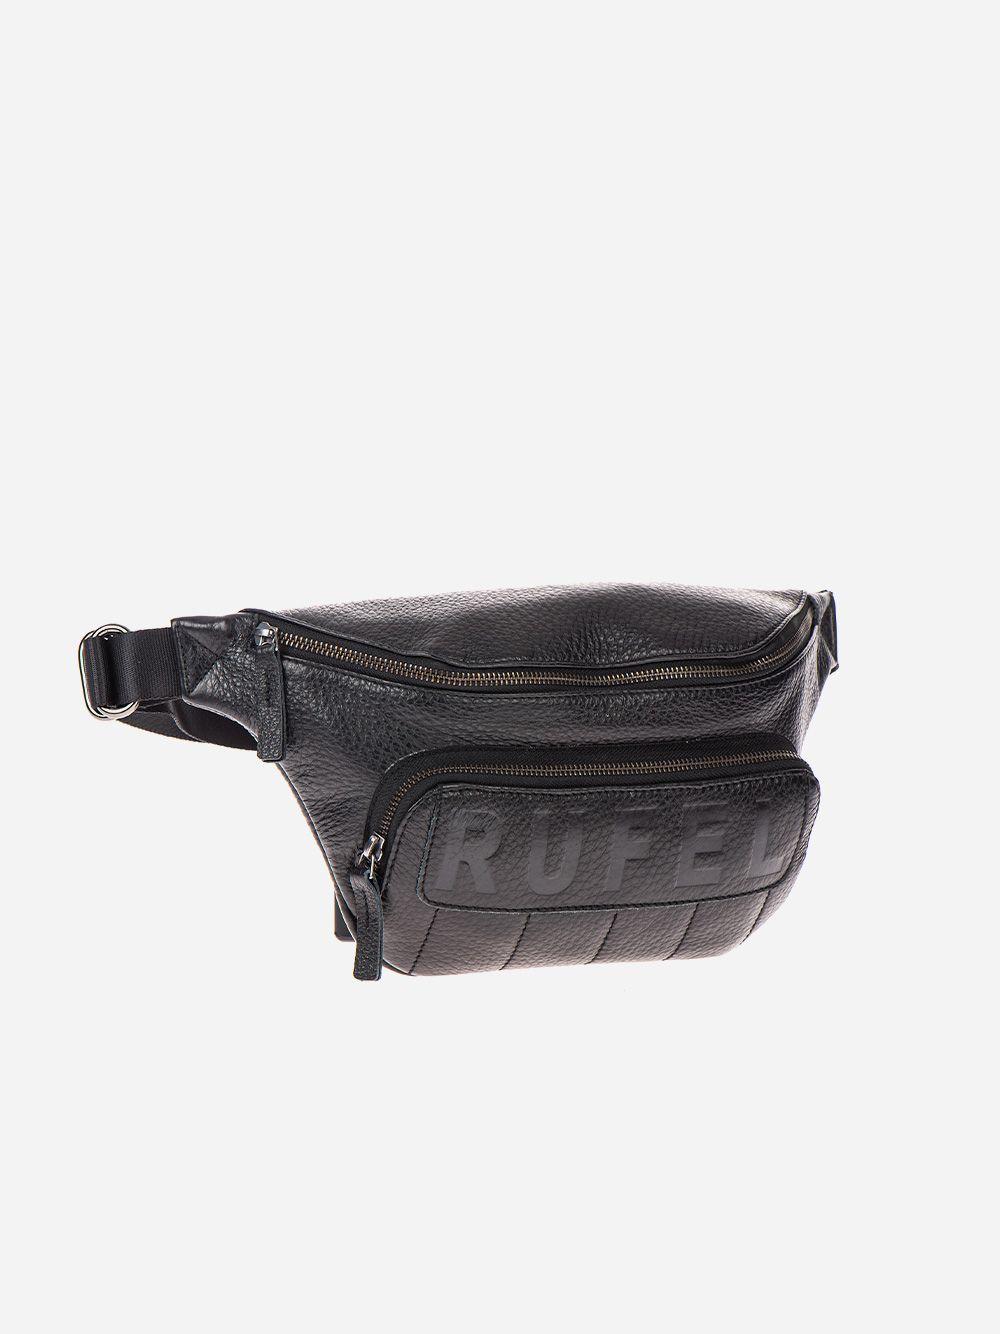 Black Belt Bag | Rufel